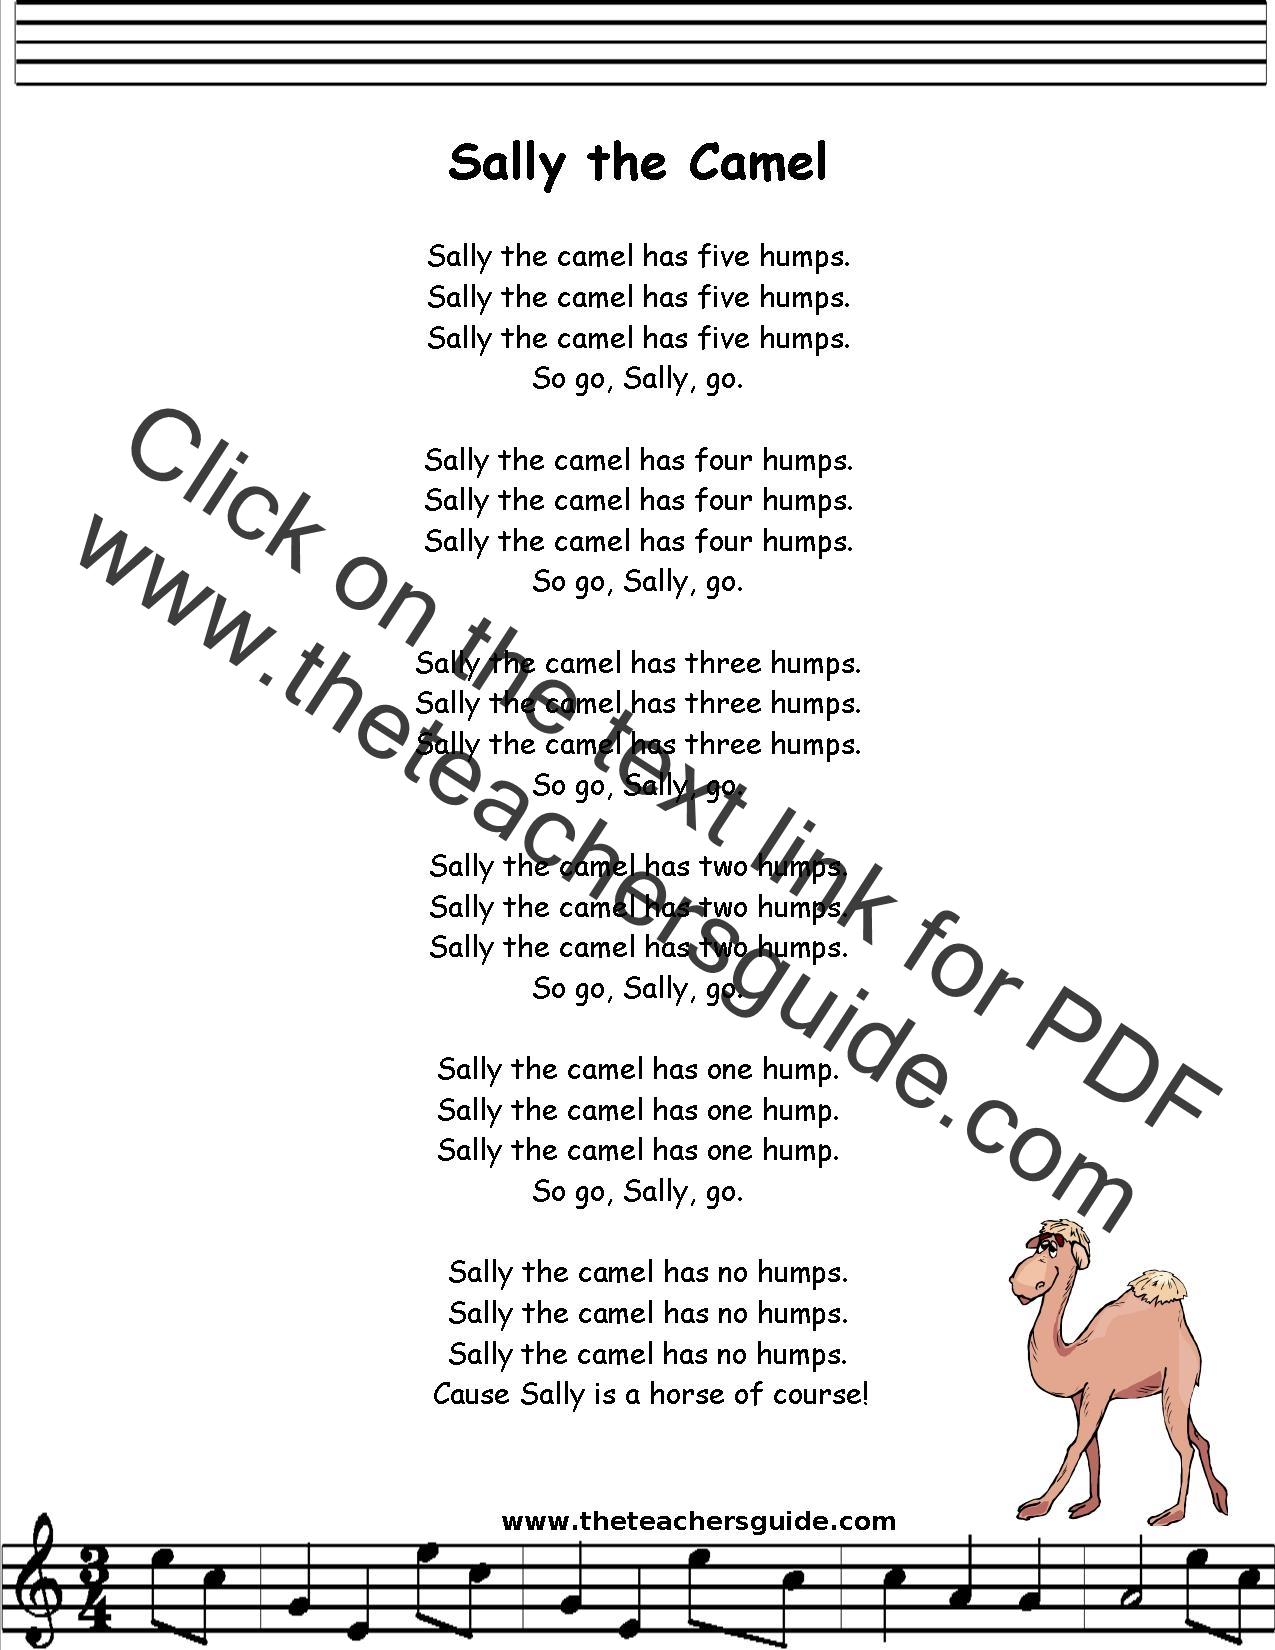 Sally the Camel Lyrics